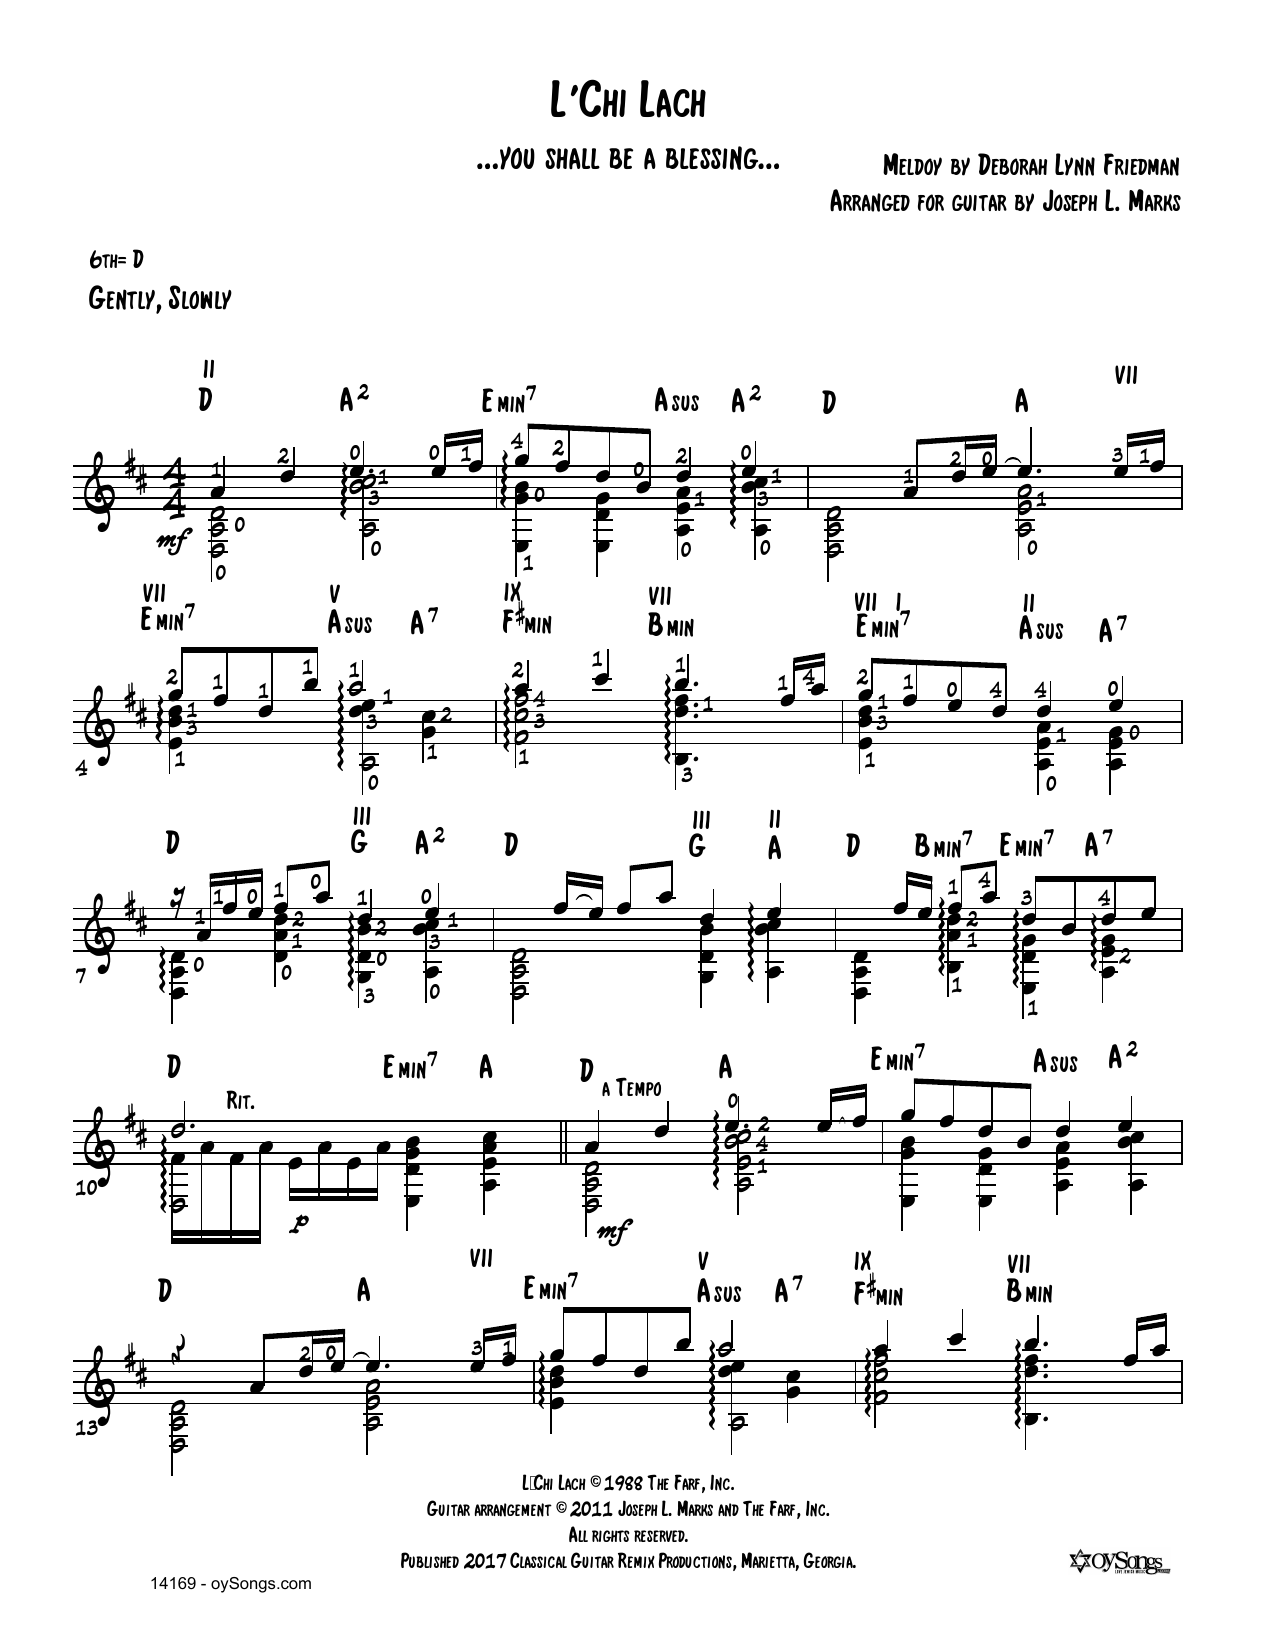 Debbie Friedman L'chi Lach (arr. Joe Marks) sheet music notes and chords. Download Printable PDF.